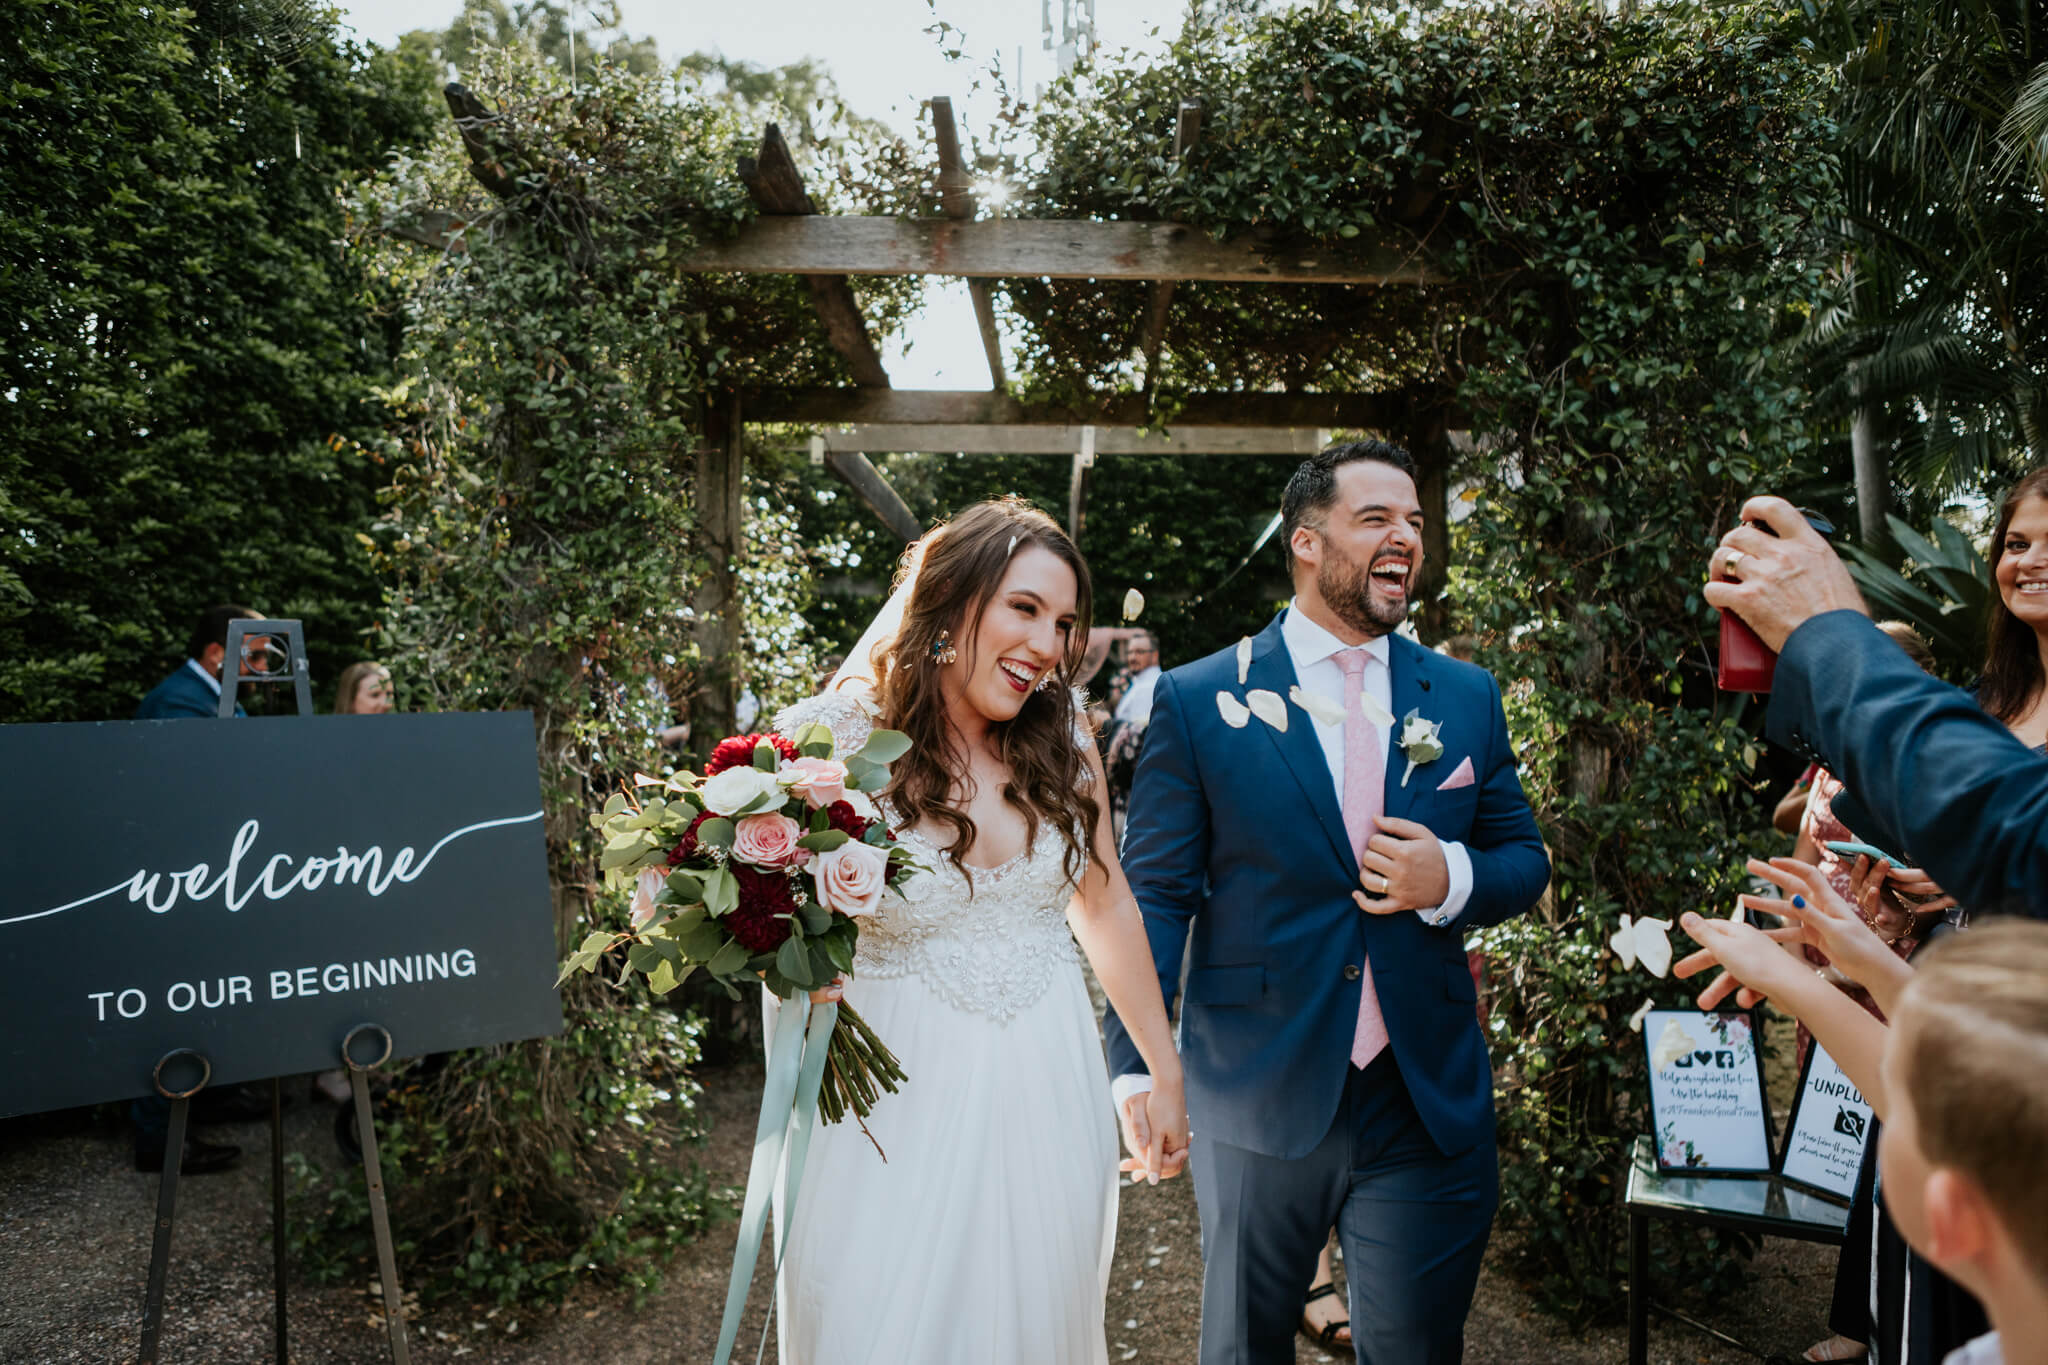 Brisbane-Wedding-Photographer-Natalie-Skoric-28.jpg